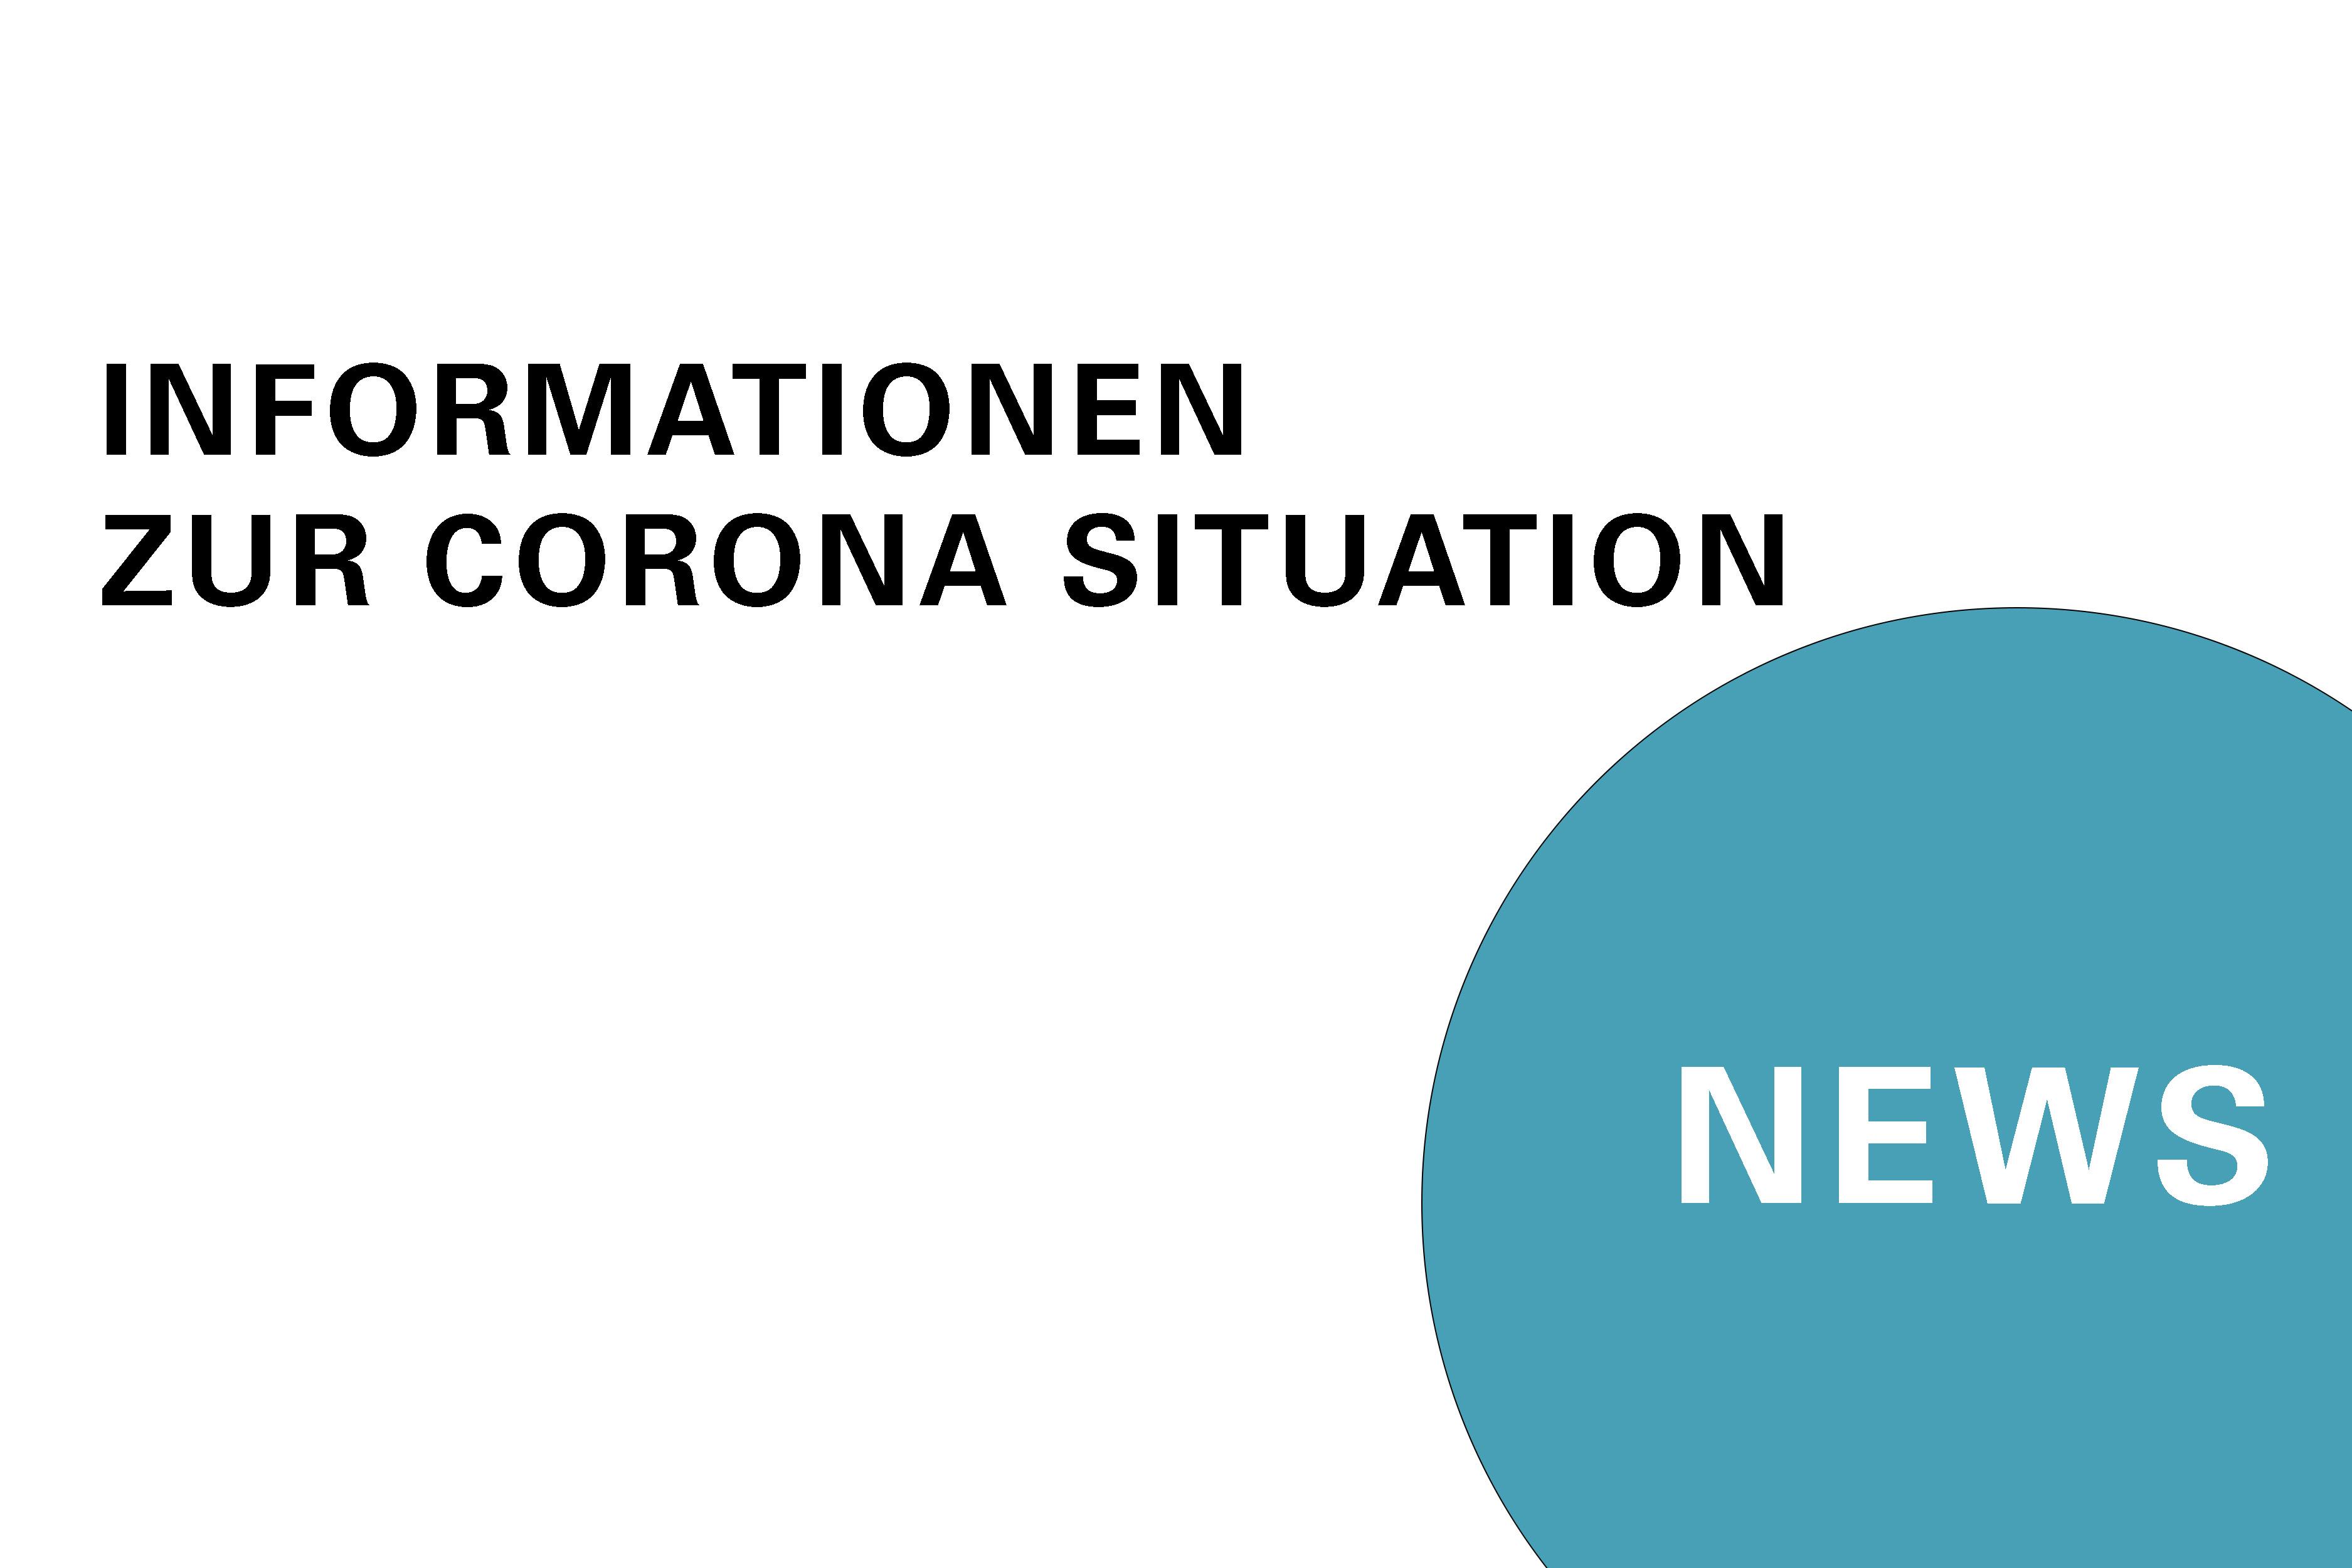 Information zur Corona Situation